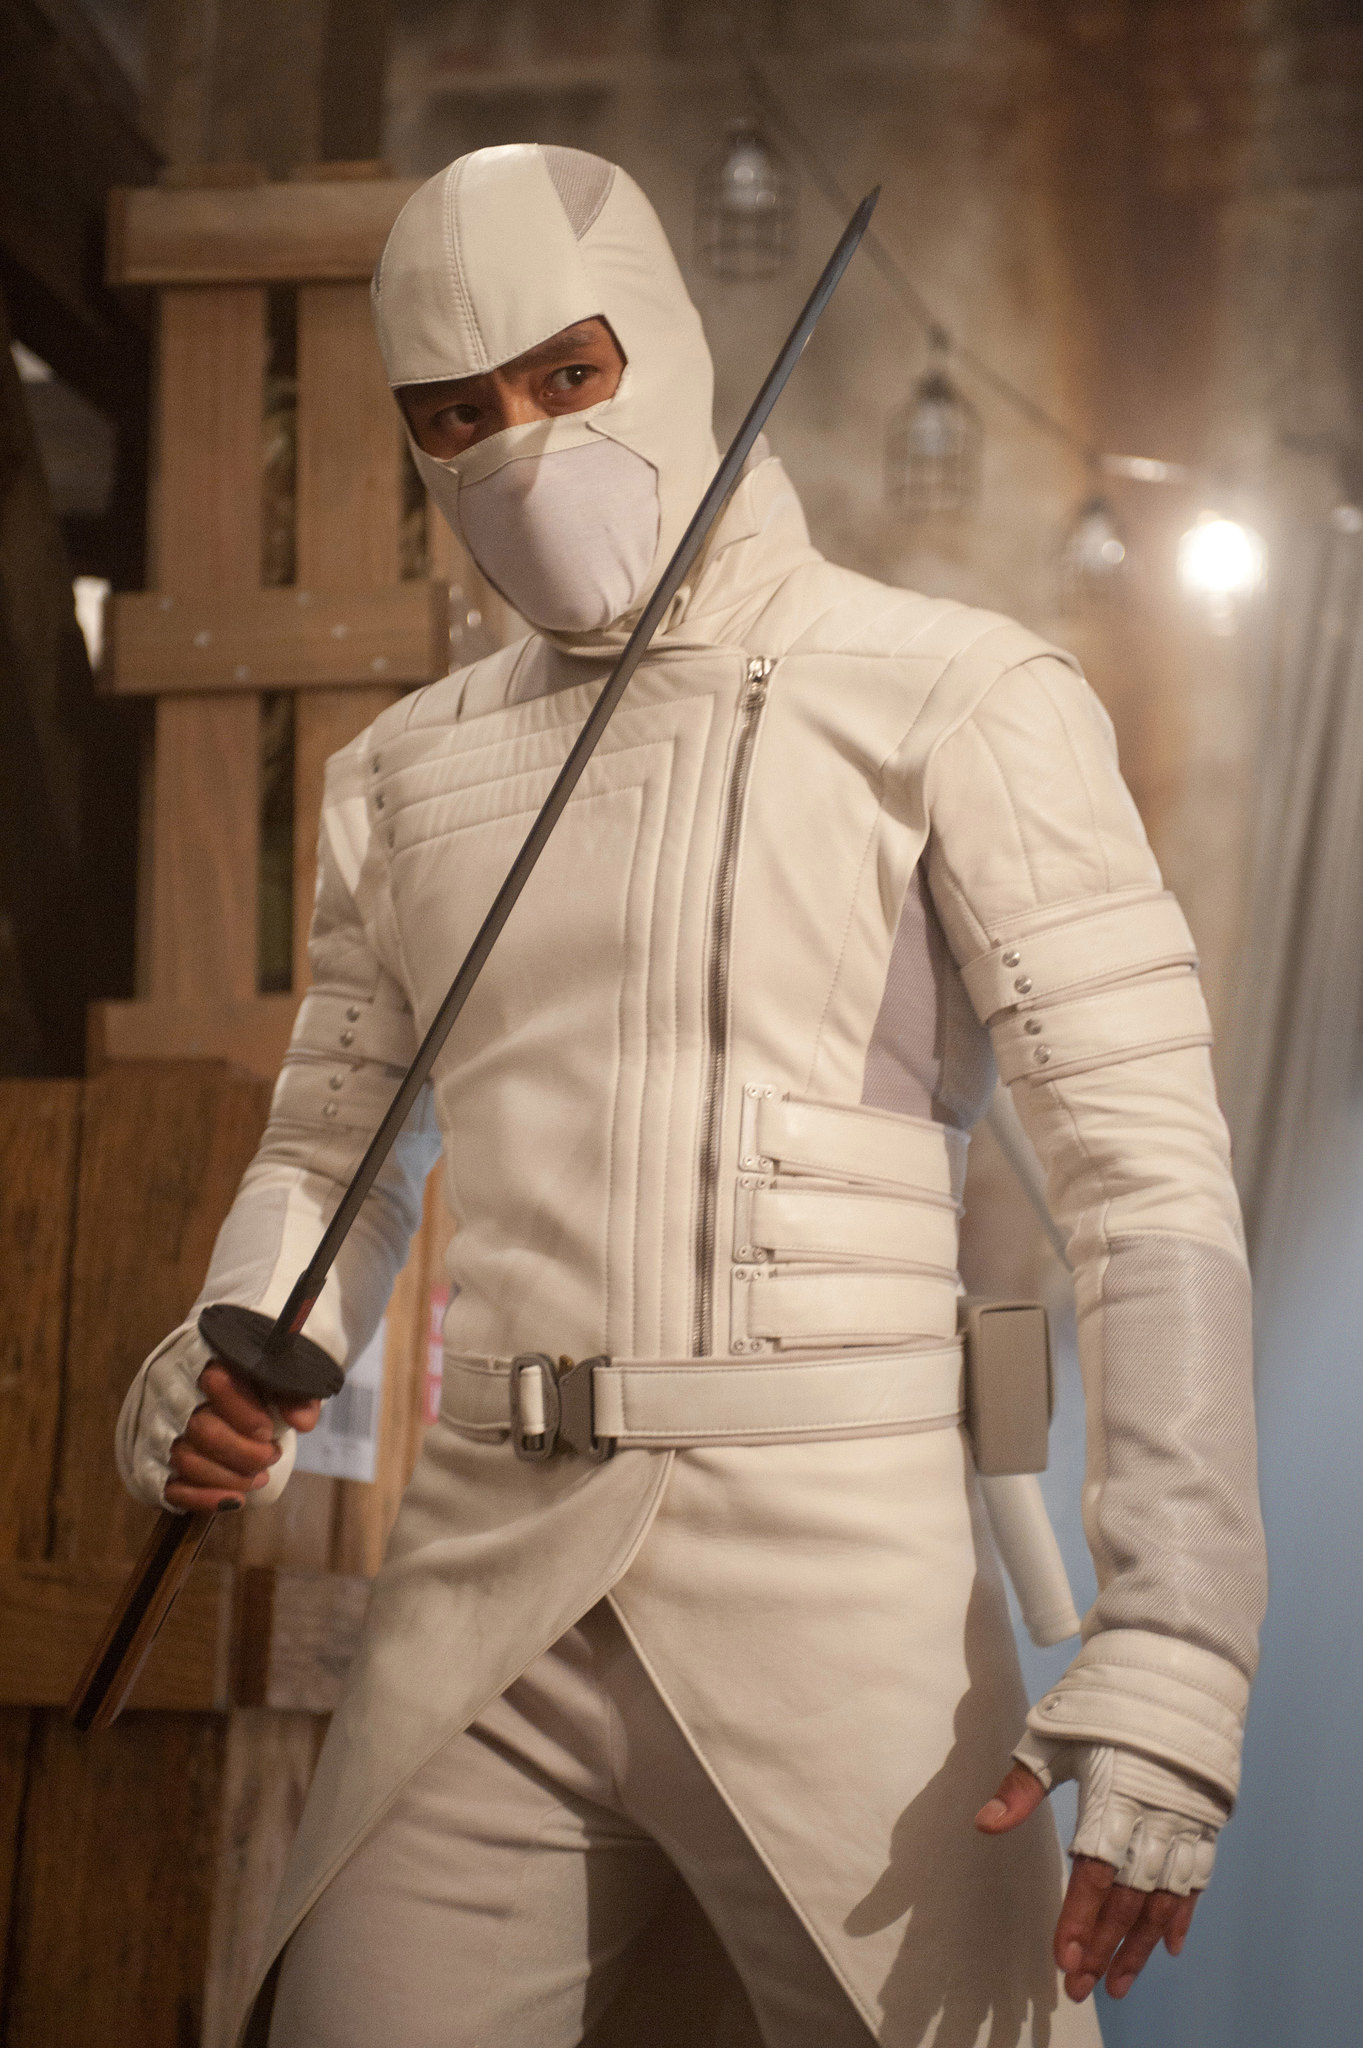 G.I. Joe: Retaliation New Movie Promo Images - HissTank.com